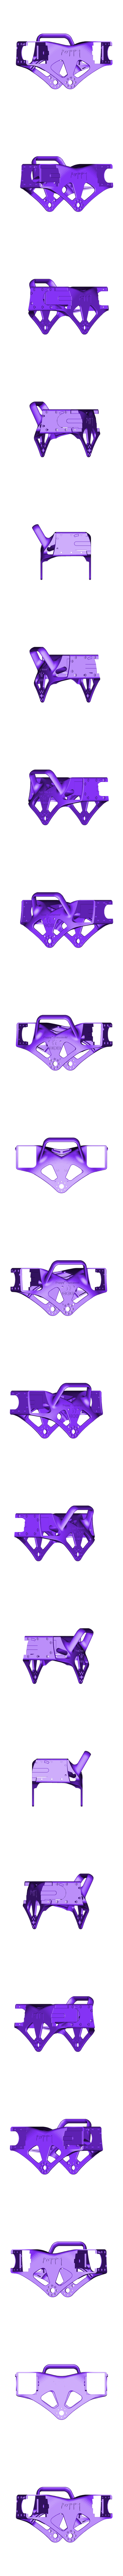 chest.STL Download free STL file Poppy Torso • 3D printable model, PoppyProject